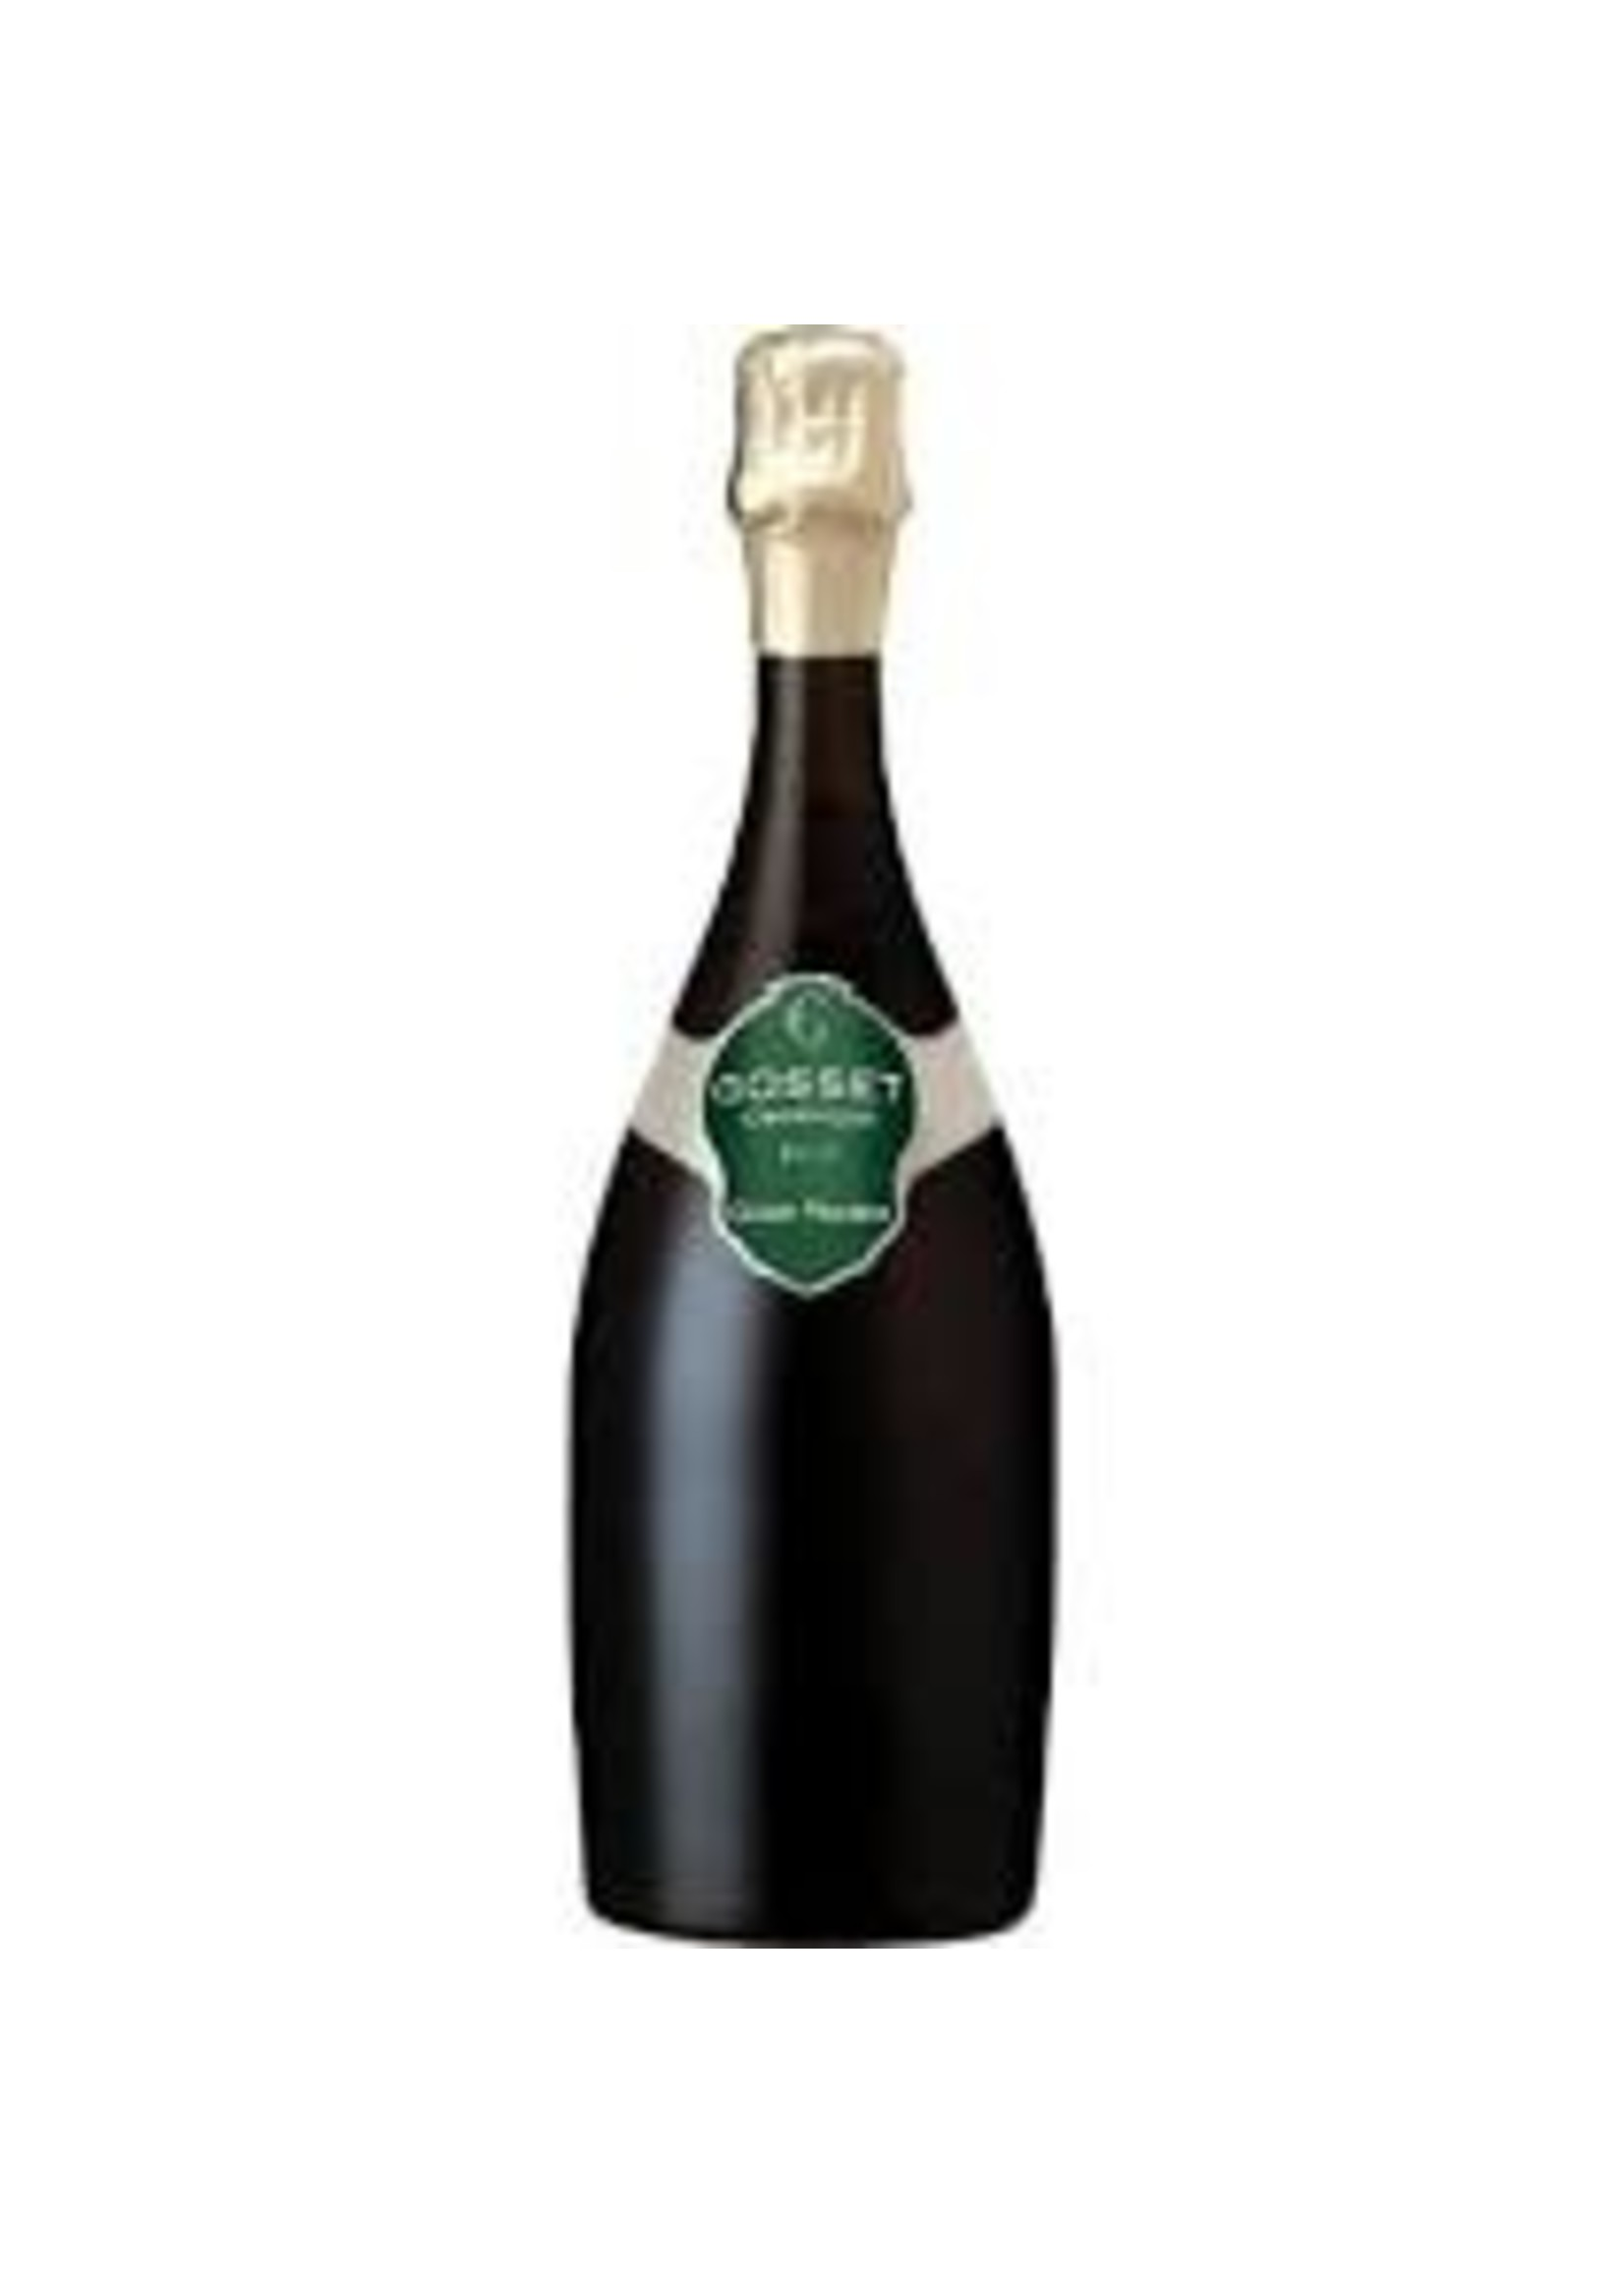 Gosset Champagne 2012 Brut Grand Millesime 750ml